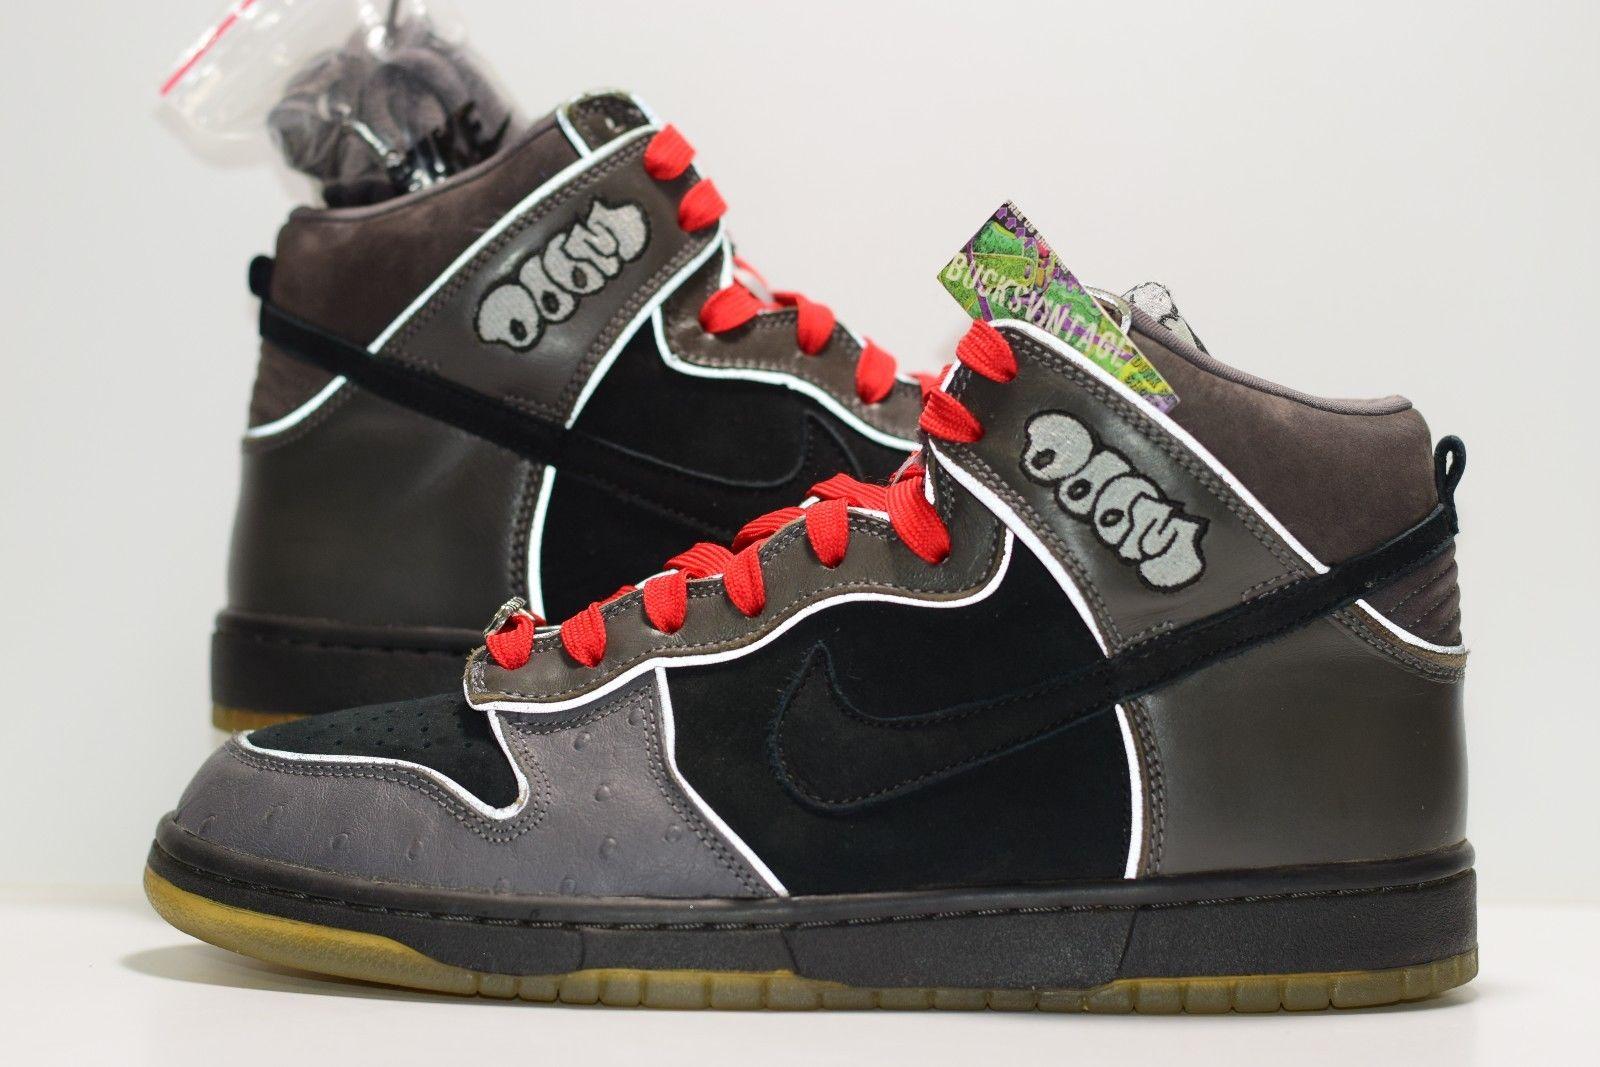 cheaper 6998d dc69d Size 9.5 | 2007 Nike Dunk High Pro SB MF Doom #313171-004  Black/Black/Midnight Fog from BucksVintage